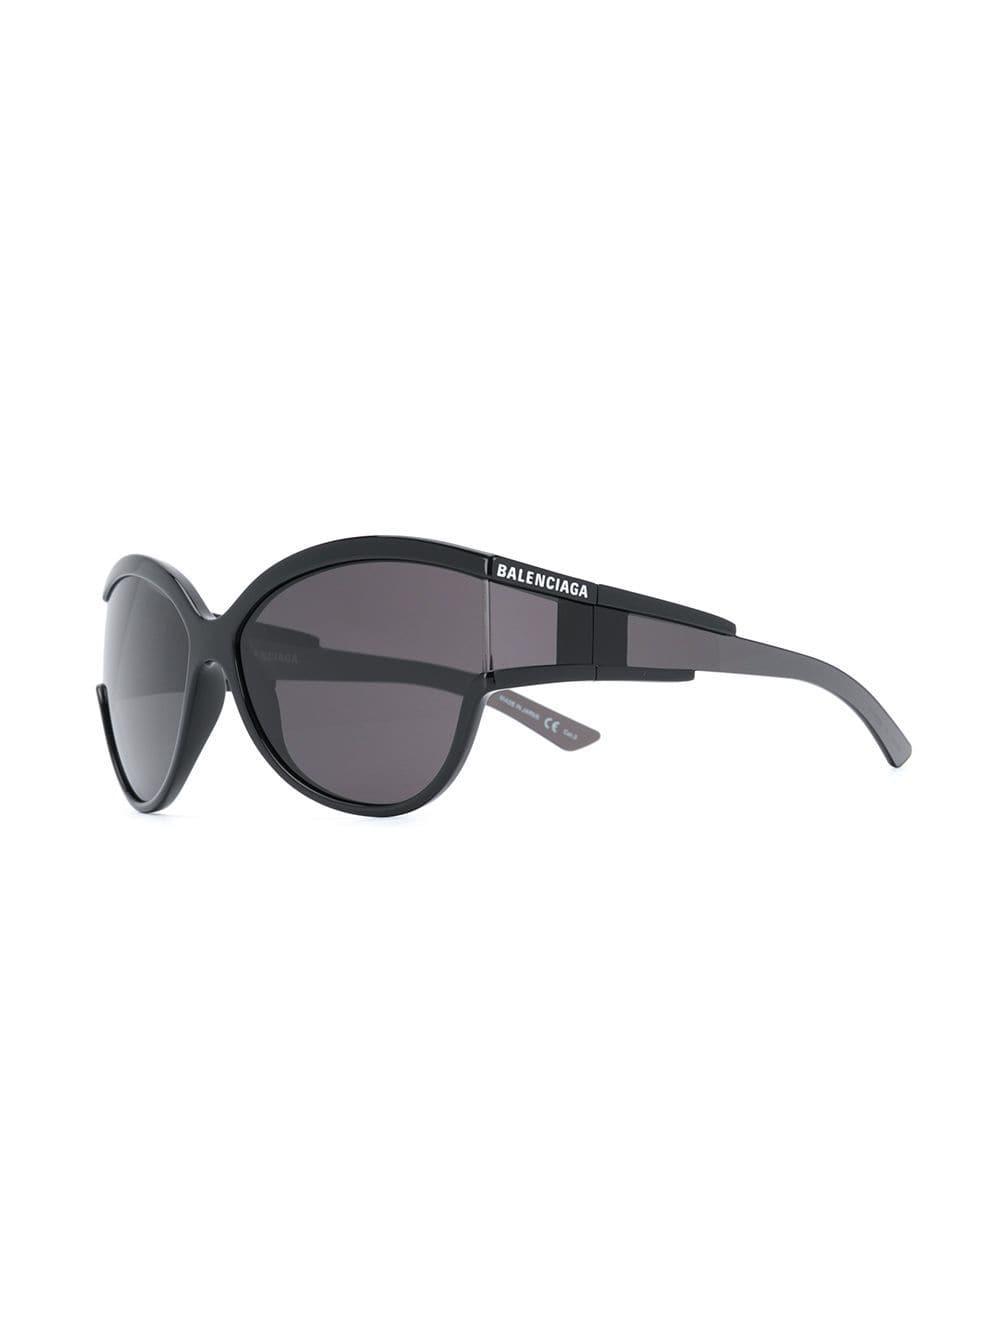 f4334a551d685 Lyst - Balenciaga Unlimited Round Sunglasses in Black - Save 25%